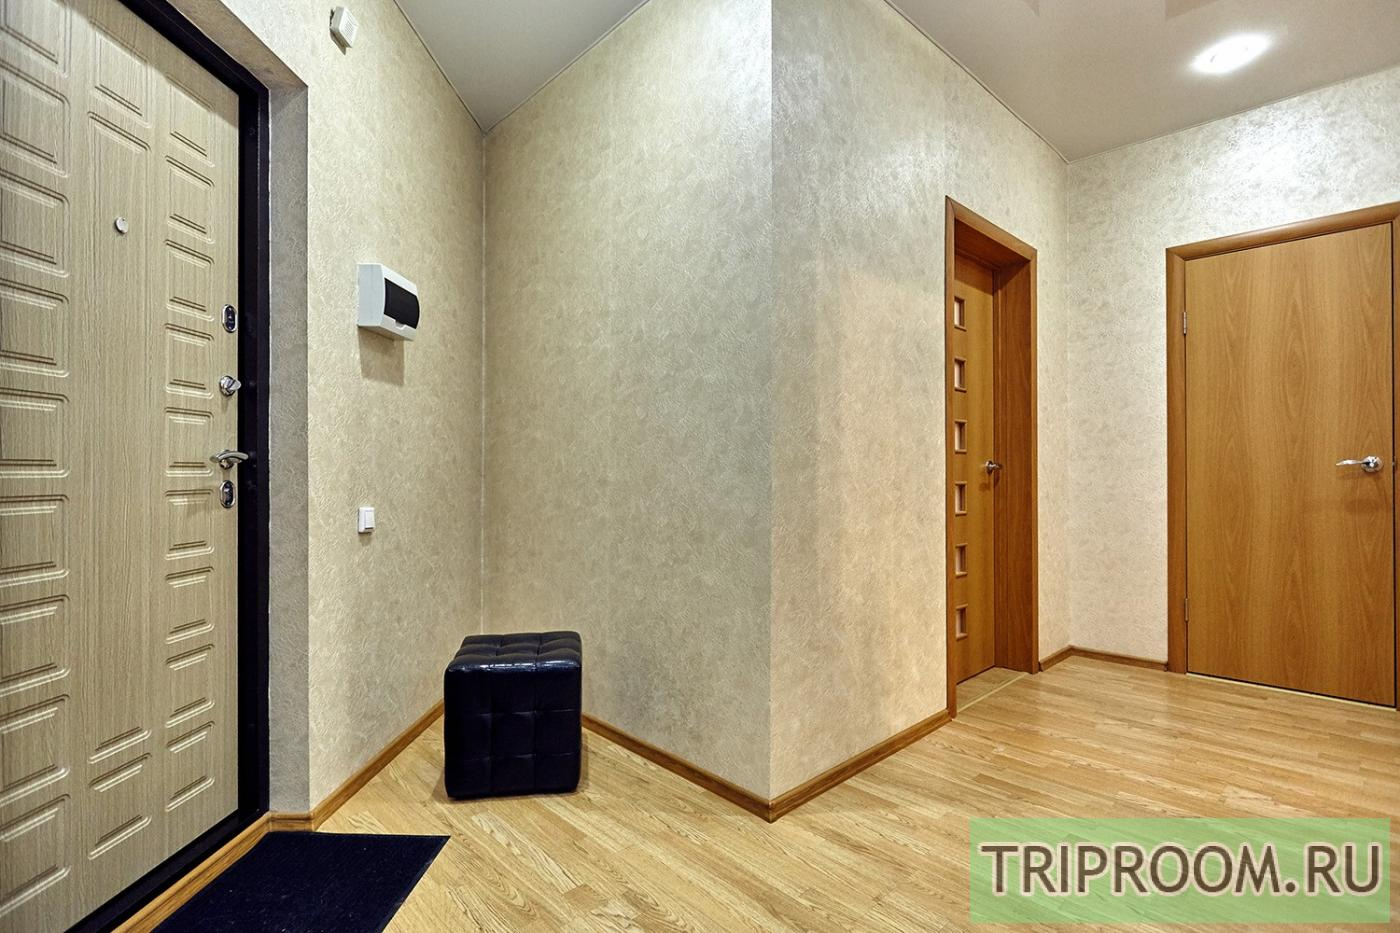 2-комнатная квартира посуточно (вариант № 10581), ул. Соколова улица, фото № 12